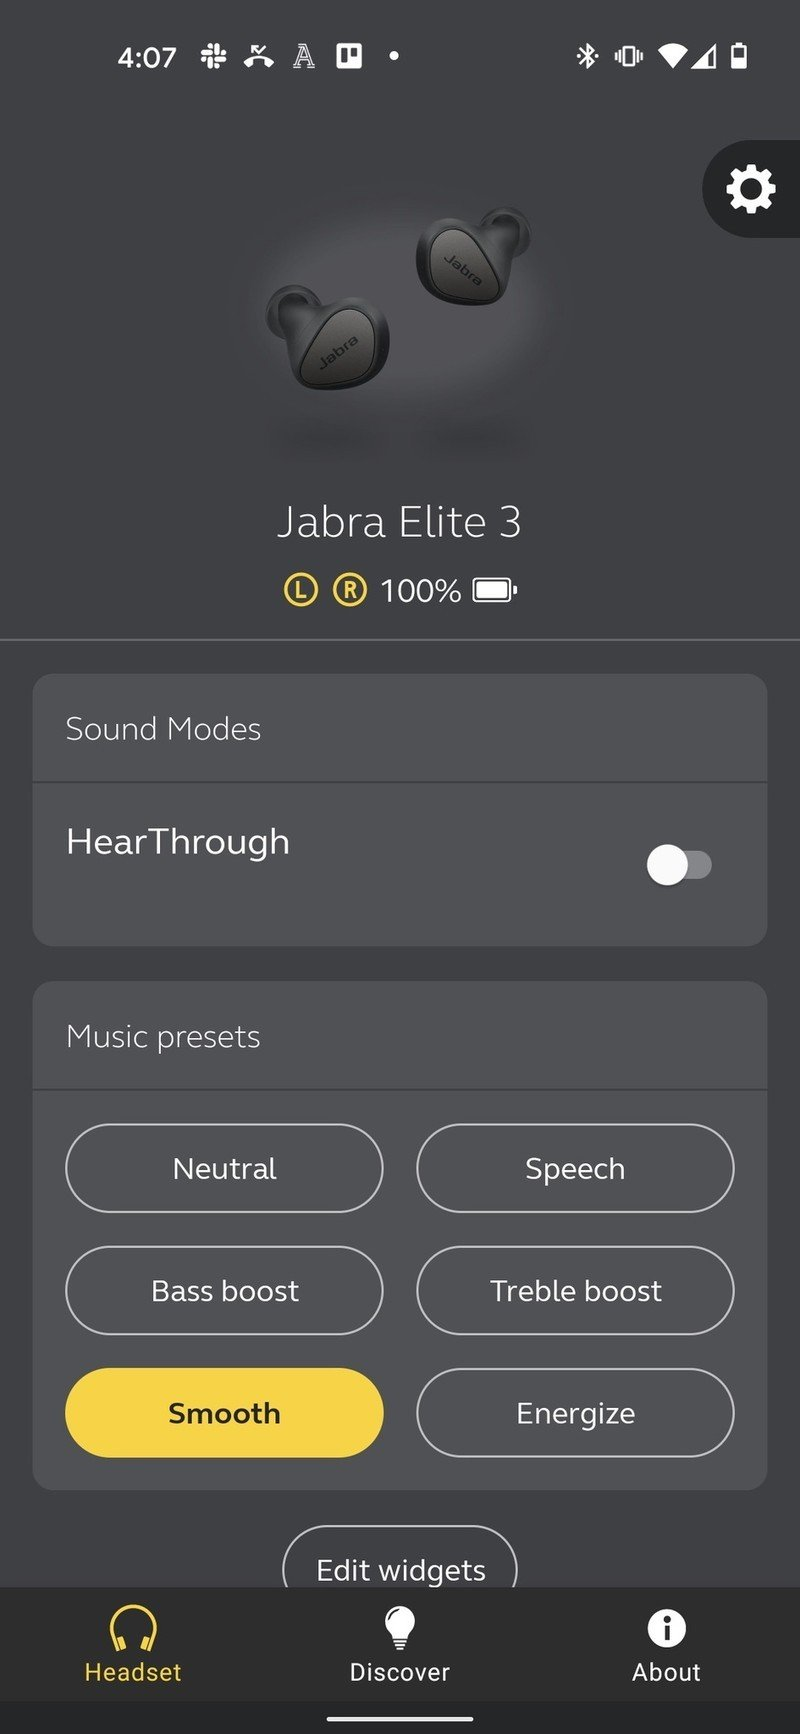 jabra-elite-3-screen-1.jpg